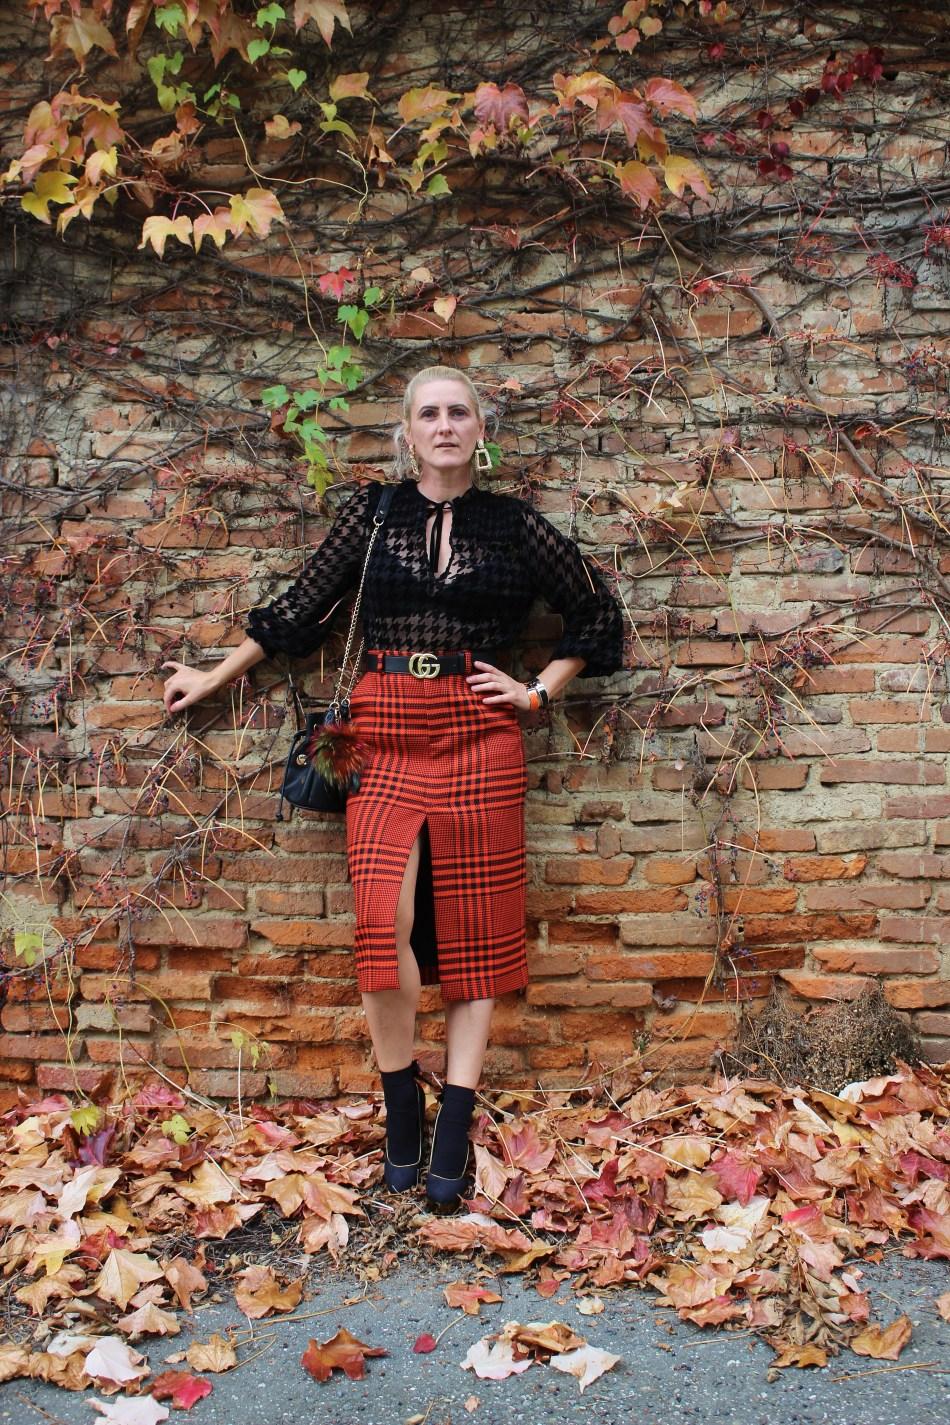 Karo-Pensilskirt-Charlotte-Olympia-Heels-Hahnentritt-Houndstooth-Muster-carrieslifestyle-Tamara-Prutsch-Gucci-Belt-Fashionsocks